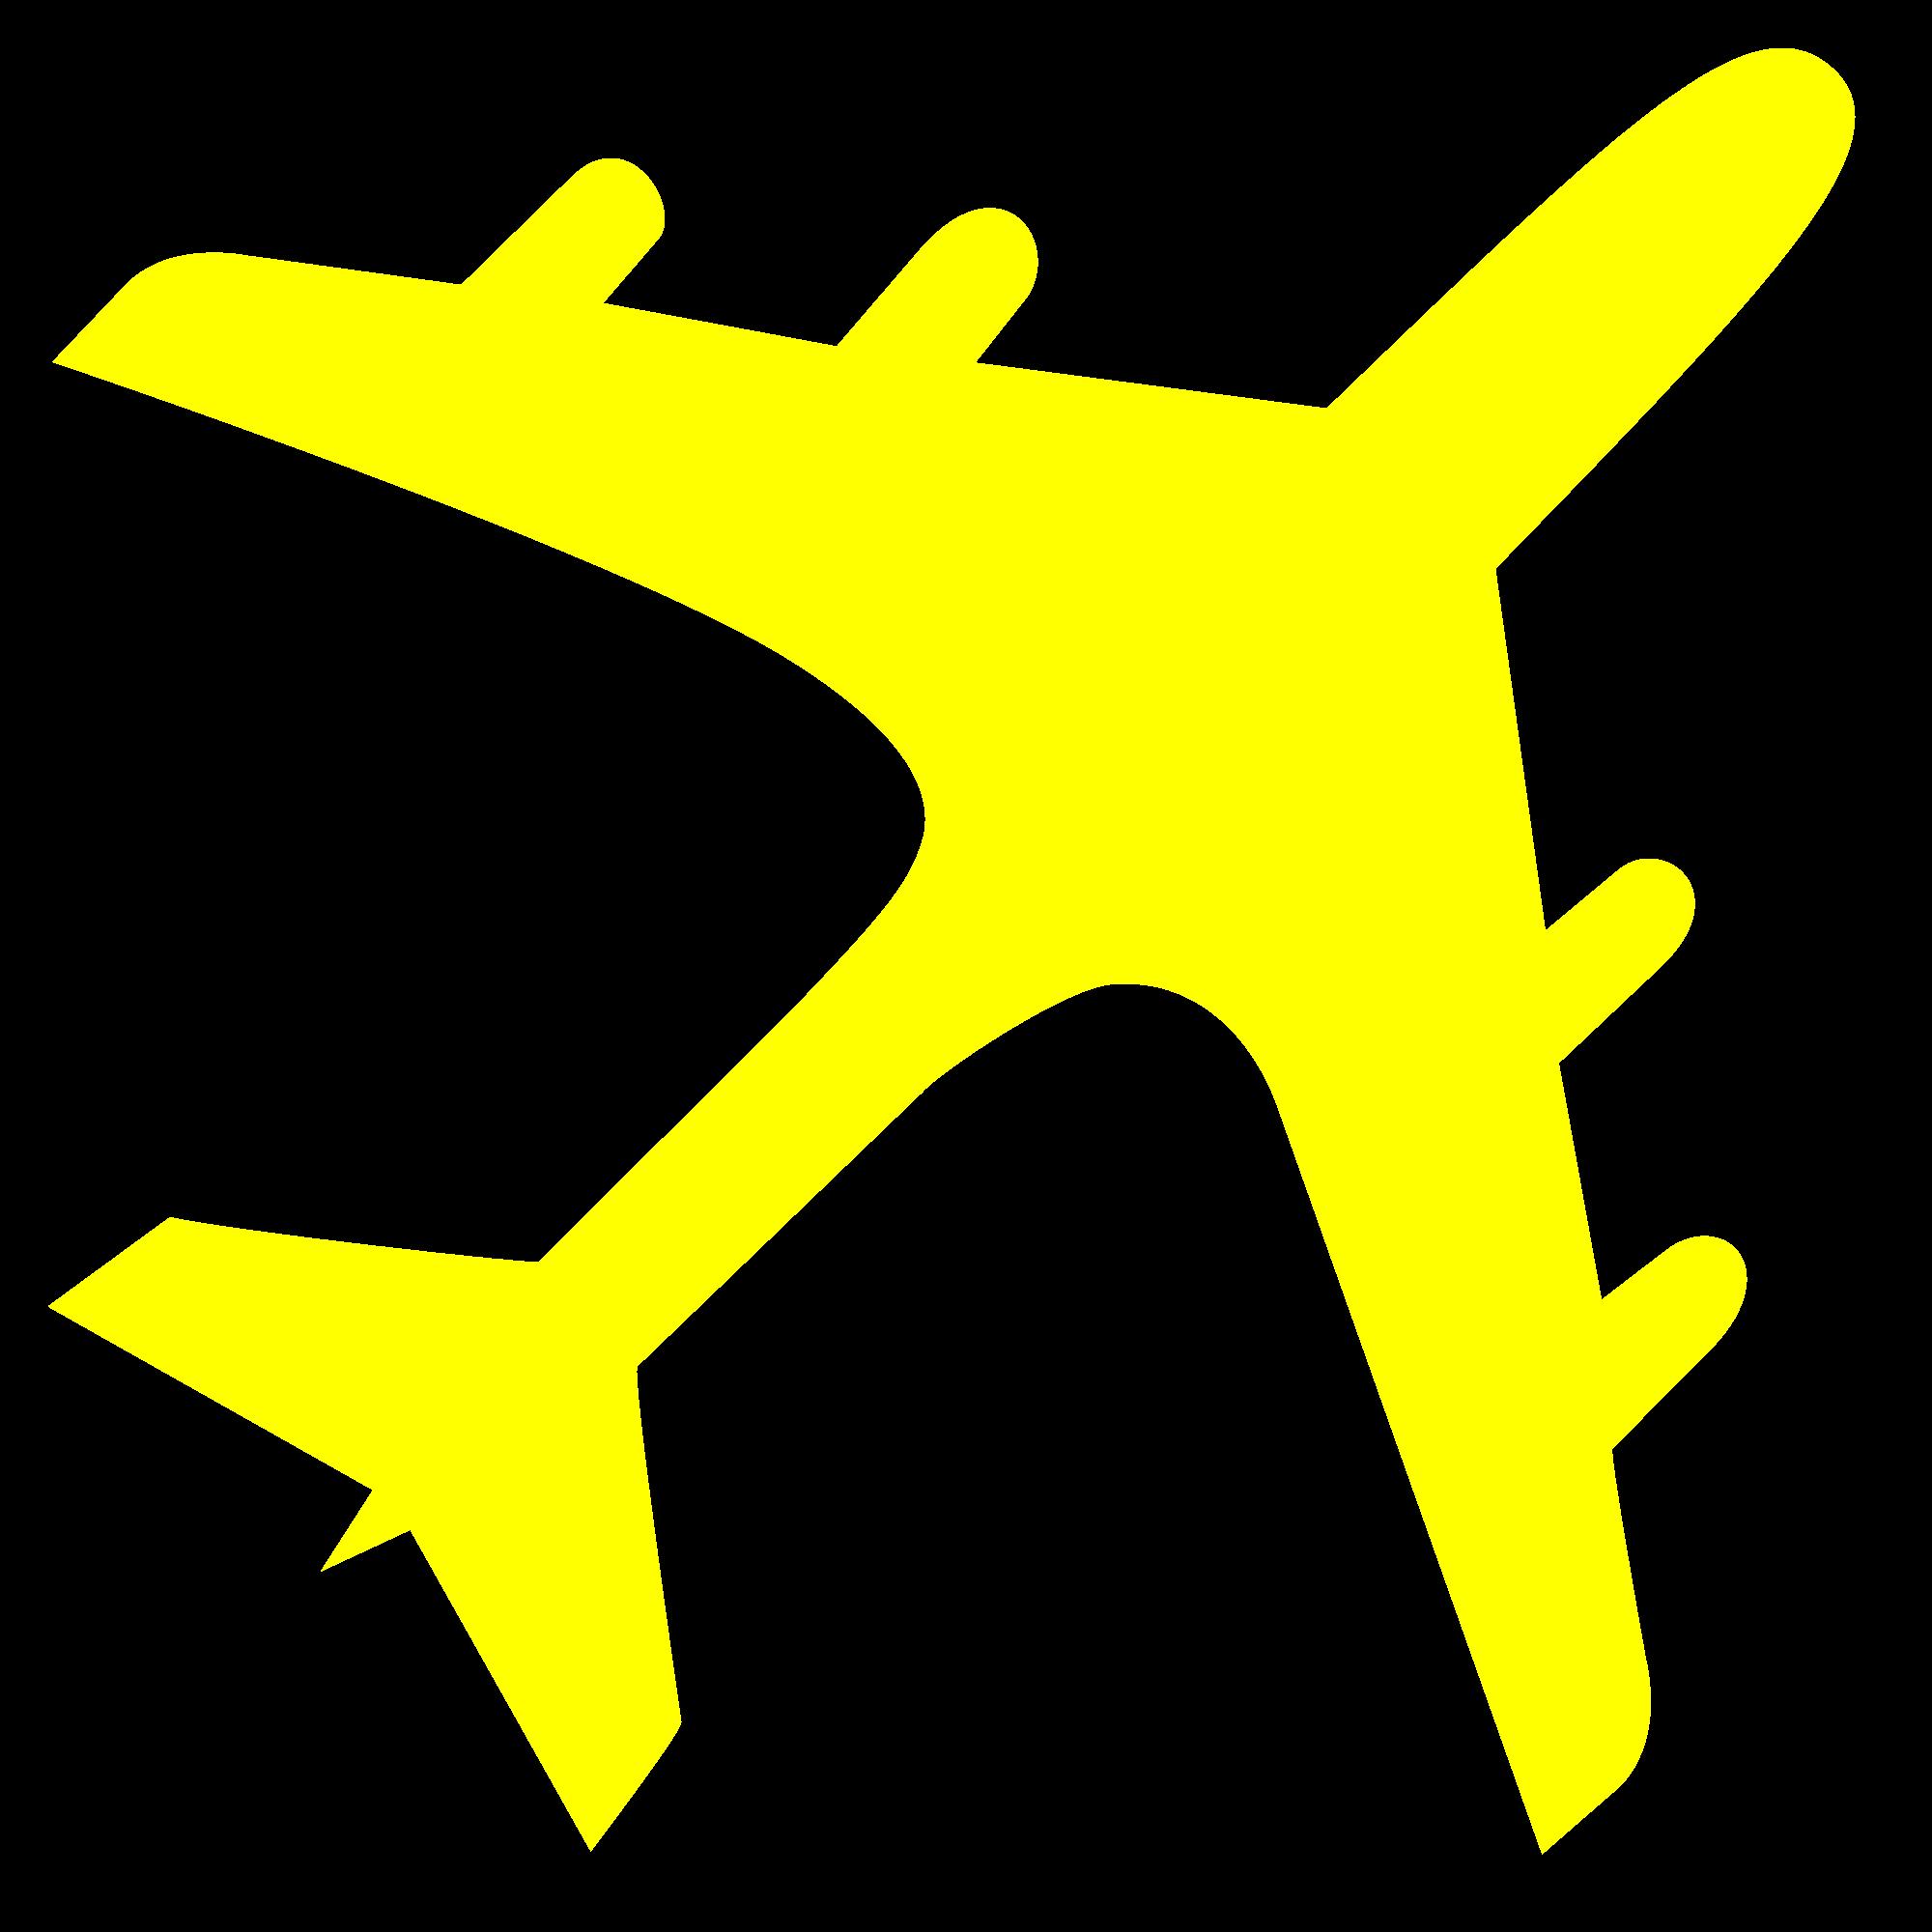 2000x2000 Jet Clipart Yellow